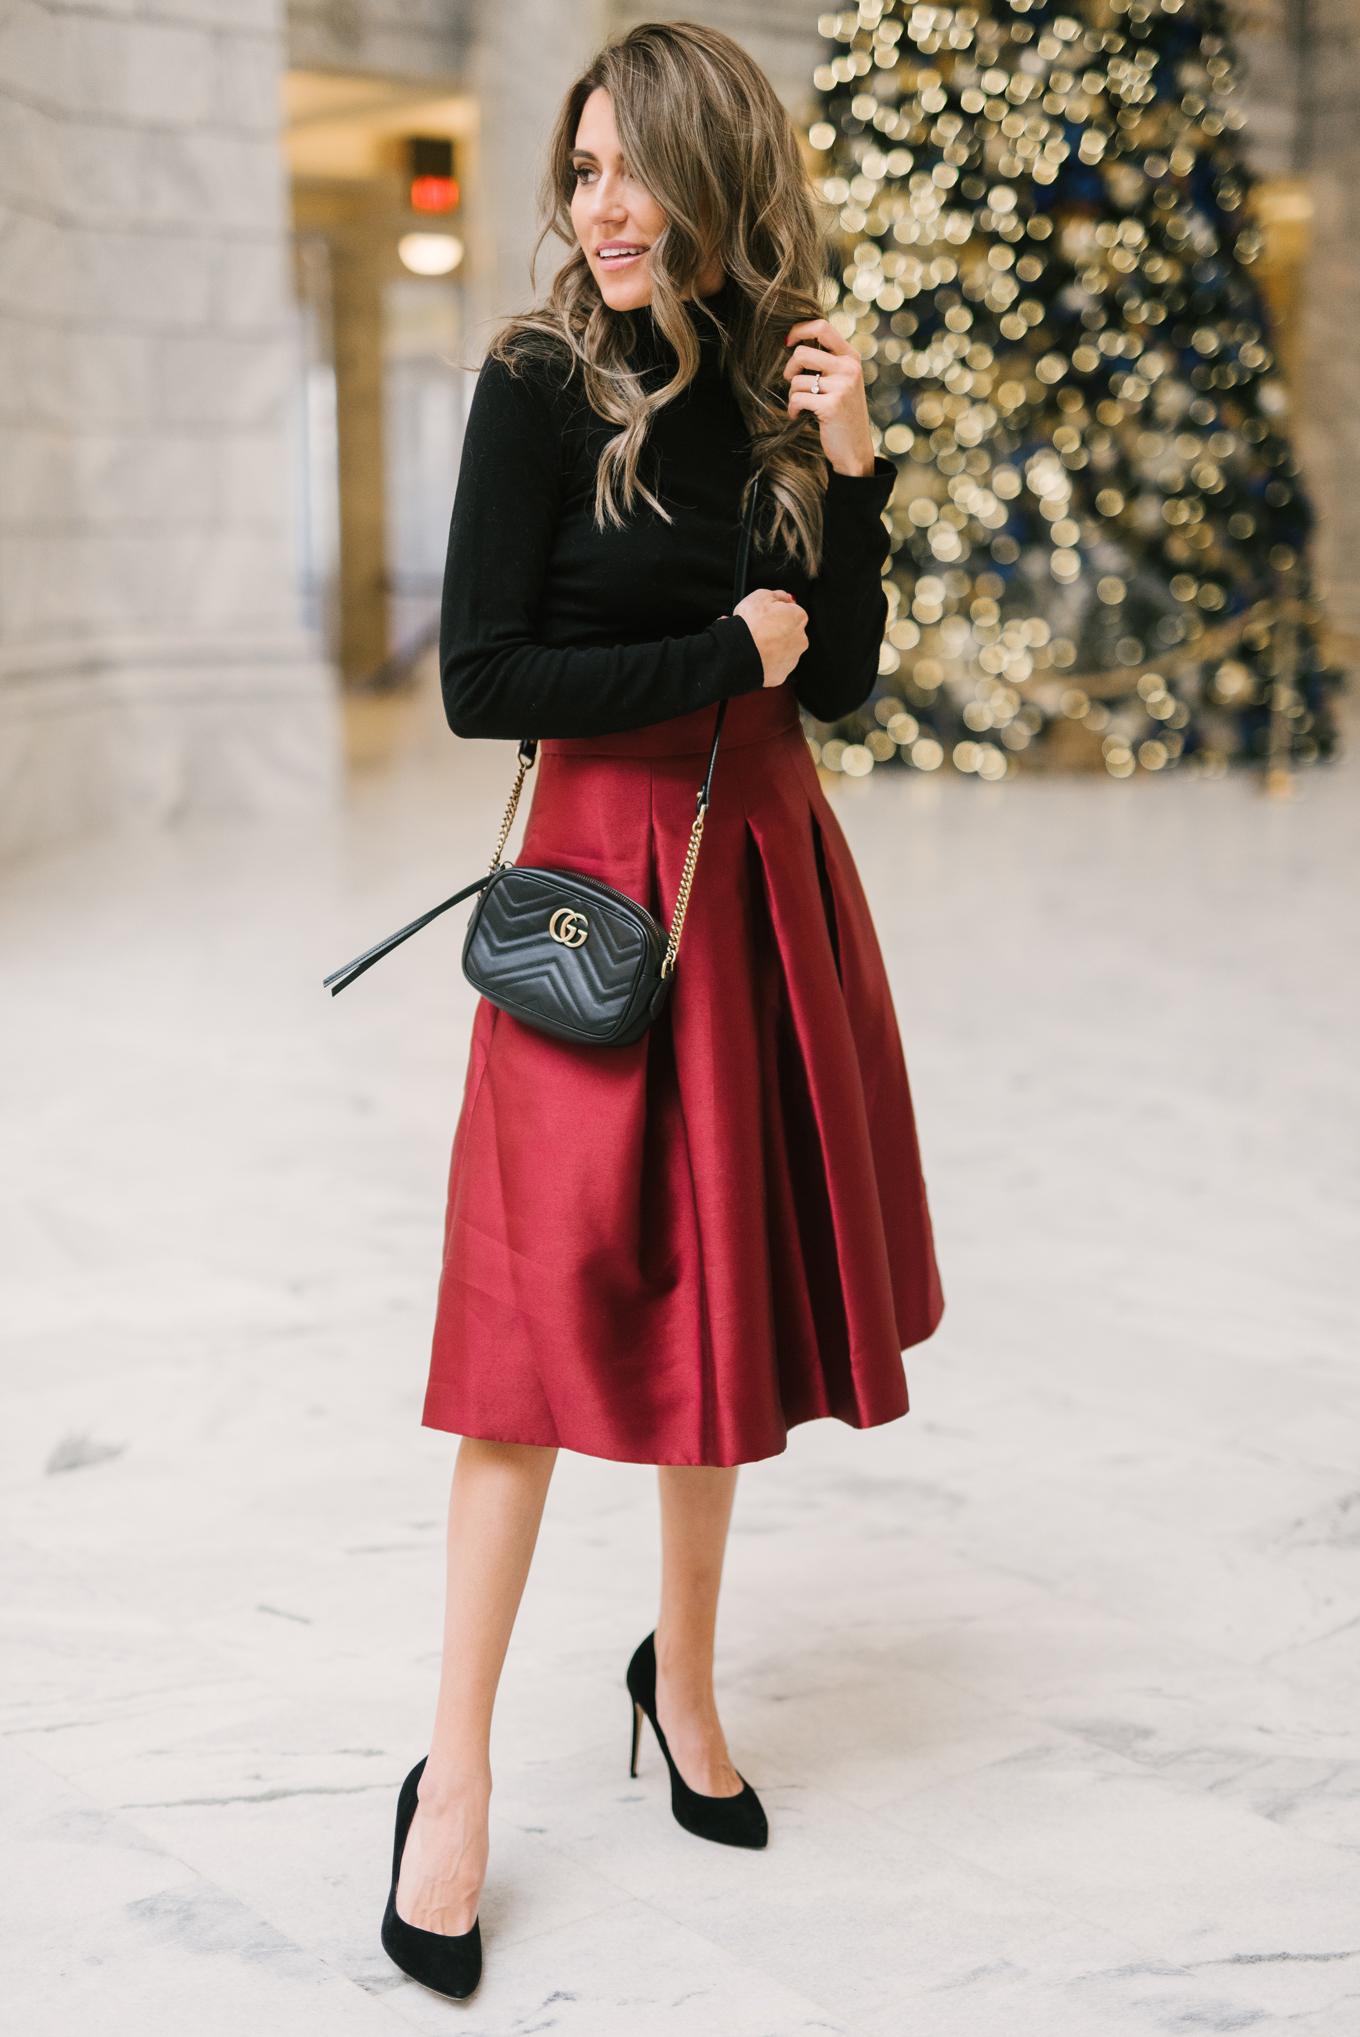 dressy holiday style christine andrew